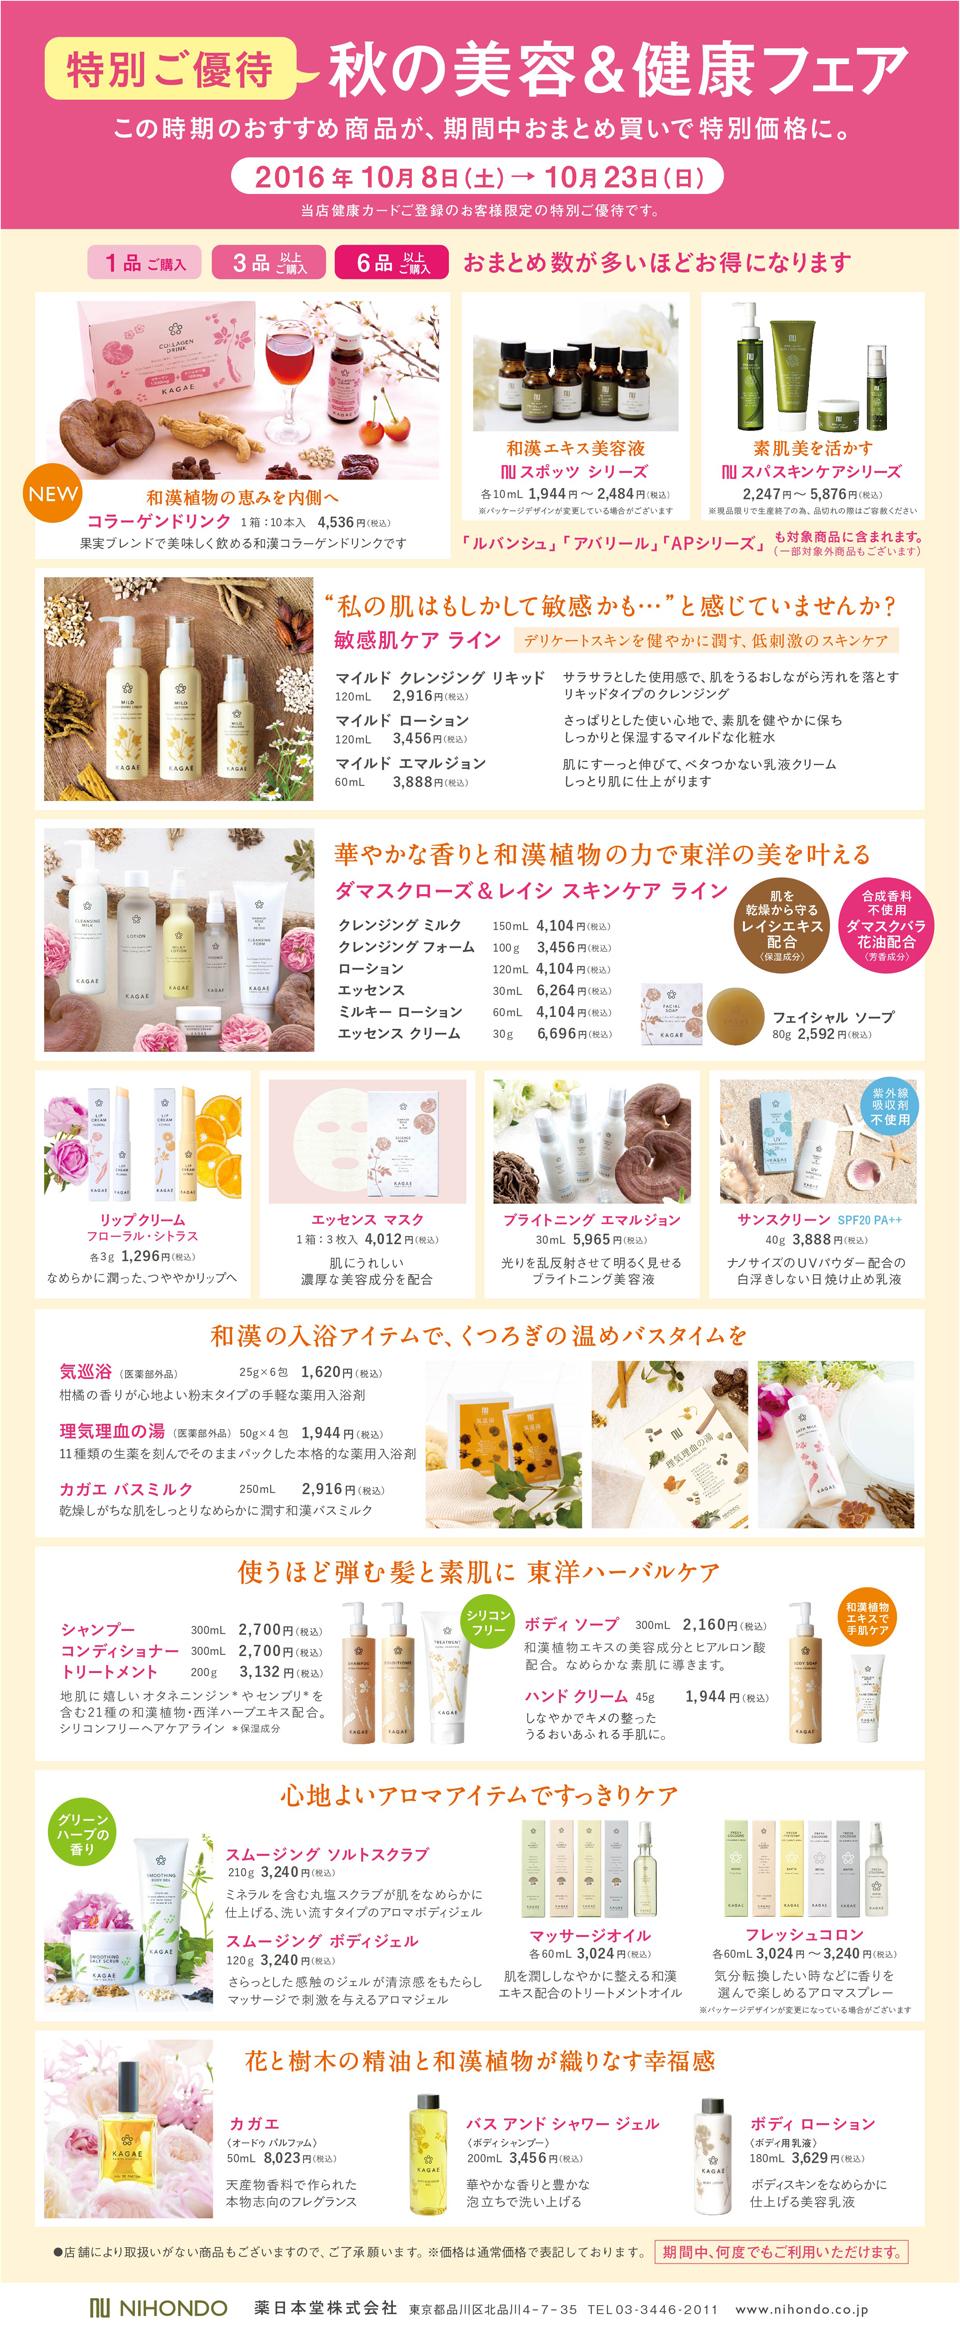 http://www.odori-bisse.com/info/up_images/nihondoh_191003.jpg